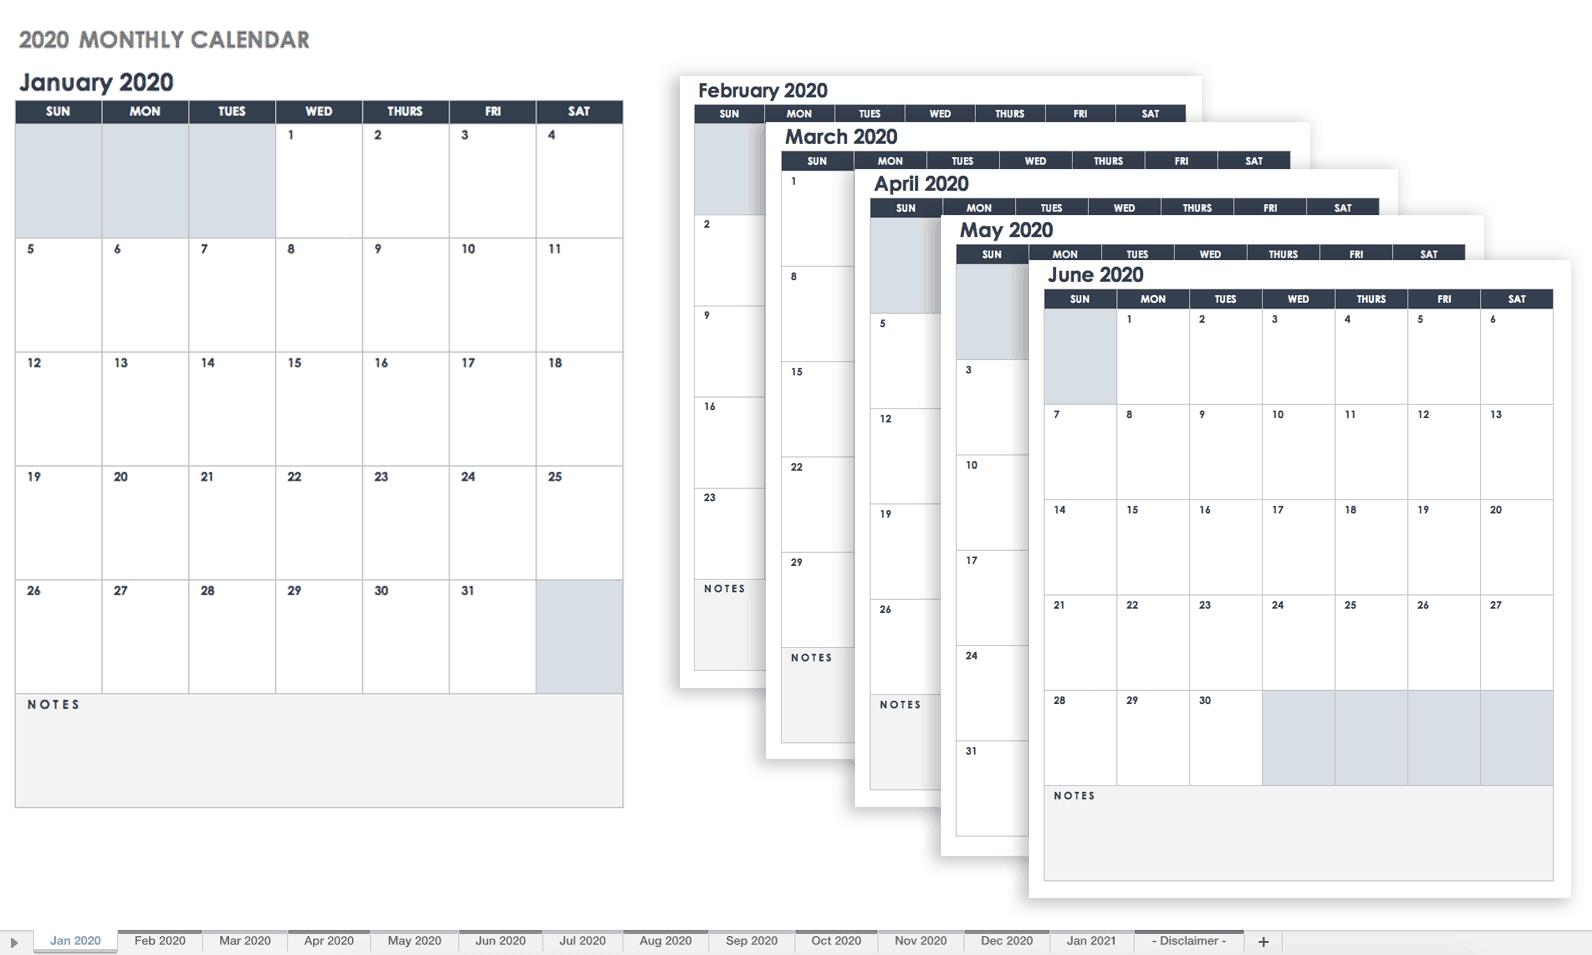 Free Google Calendar Templates | Smartsheet-Editable 3 Month Calendar Template 2020